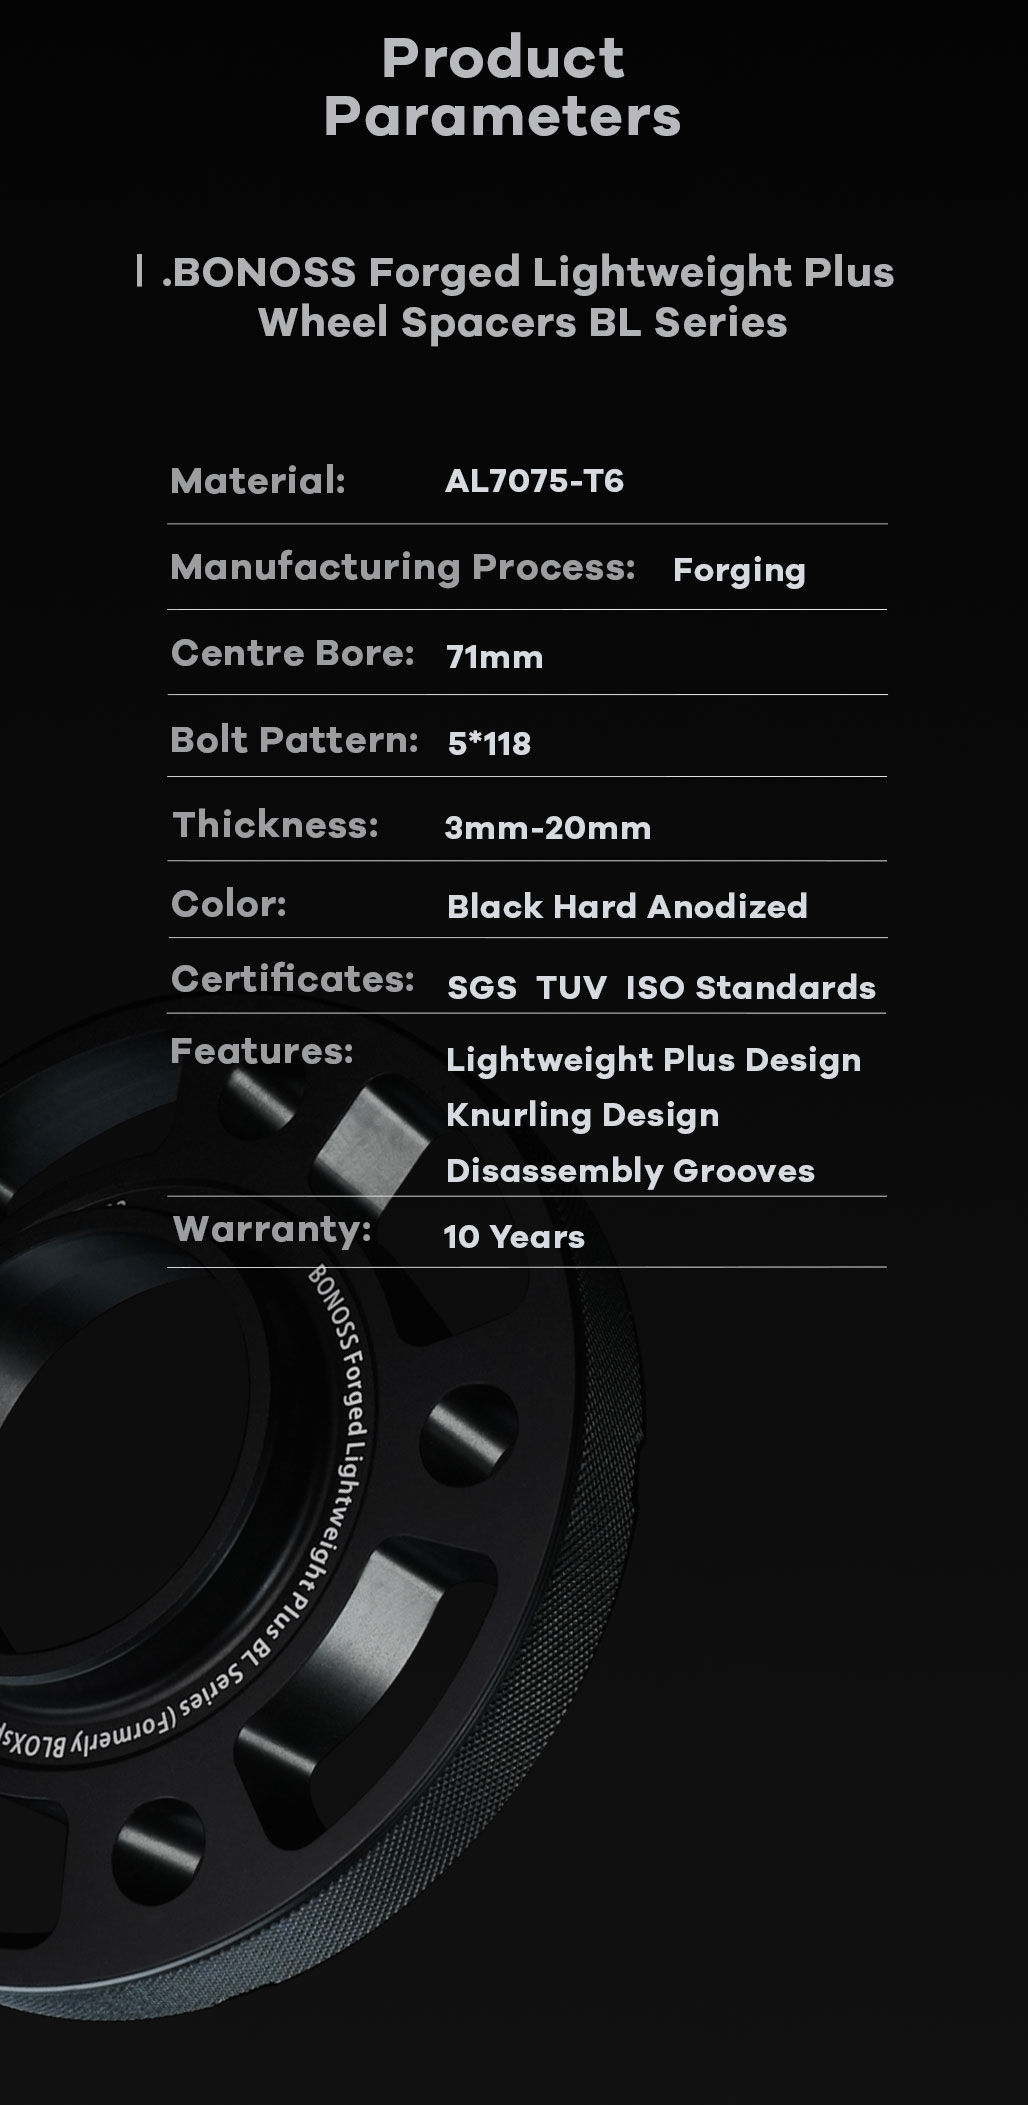 BONOSS-forged-lightweight-plus-wheel-spacer-for-Opel-Vivaro-A-5x118-71-14x1.5-7075t6-by-grace-2